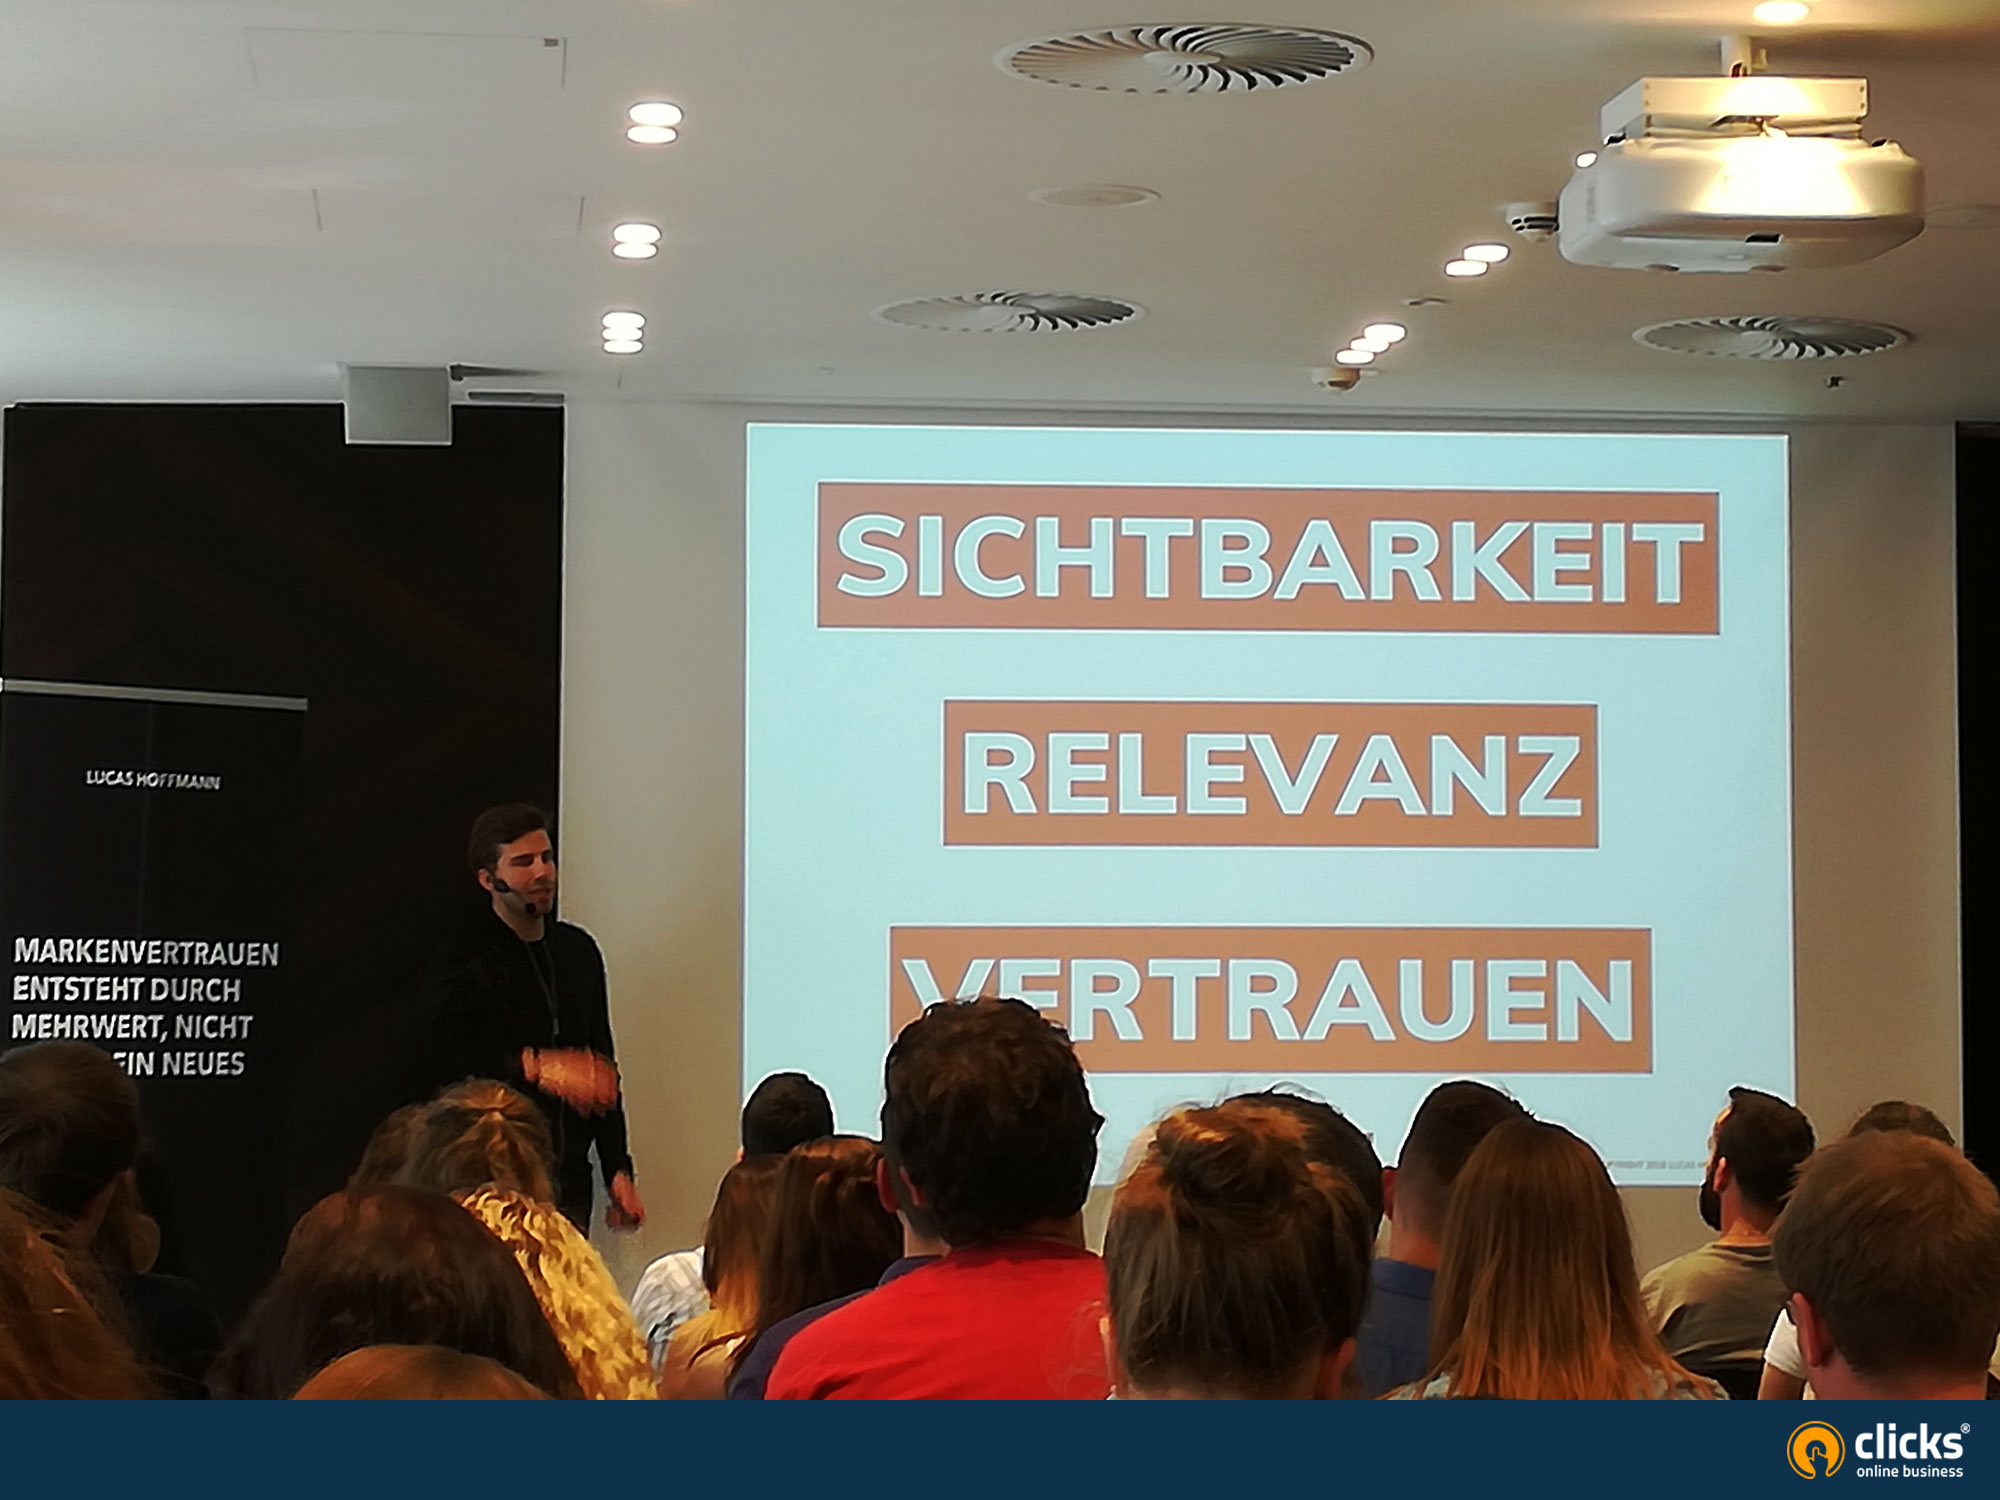 Social Media Marketing - Social Media Bootcamp by Lucas Hoffmann